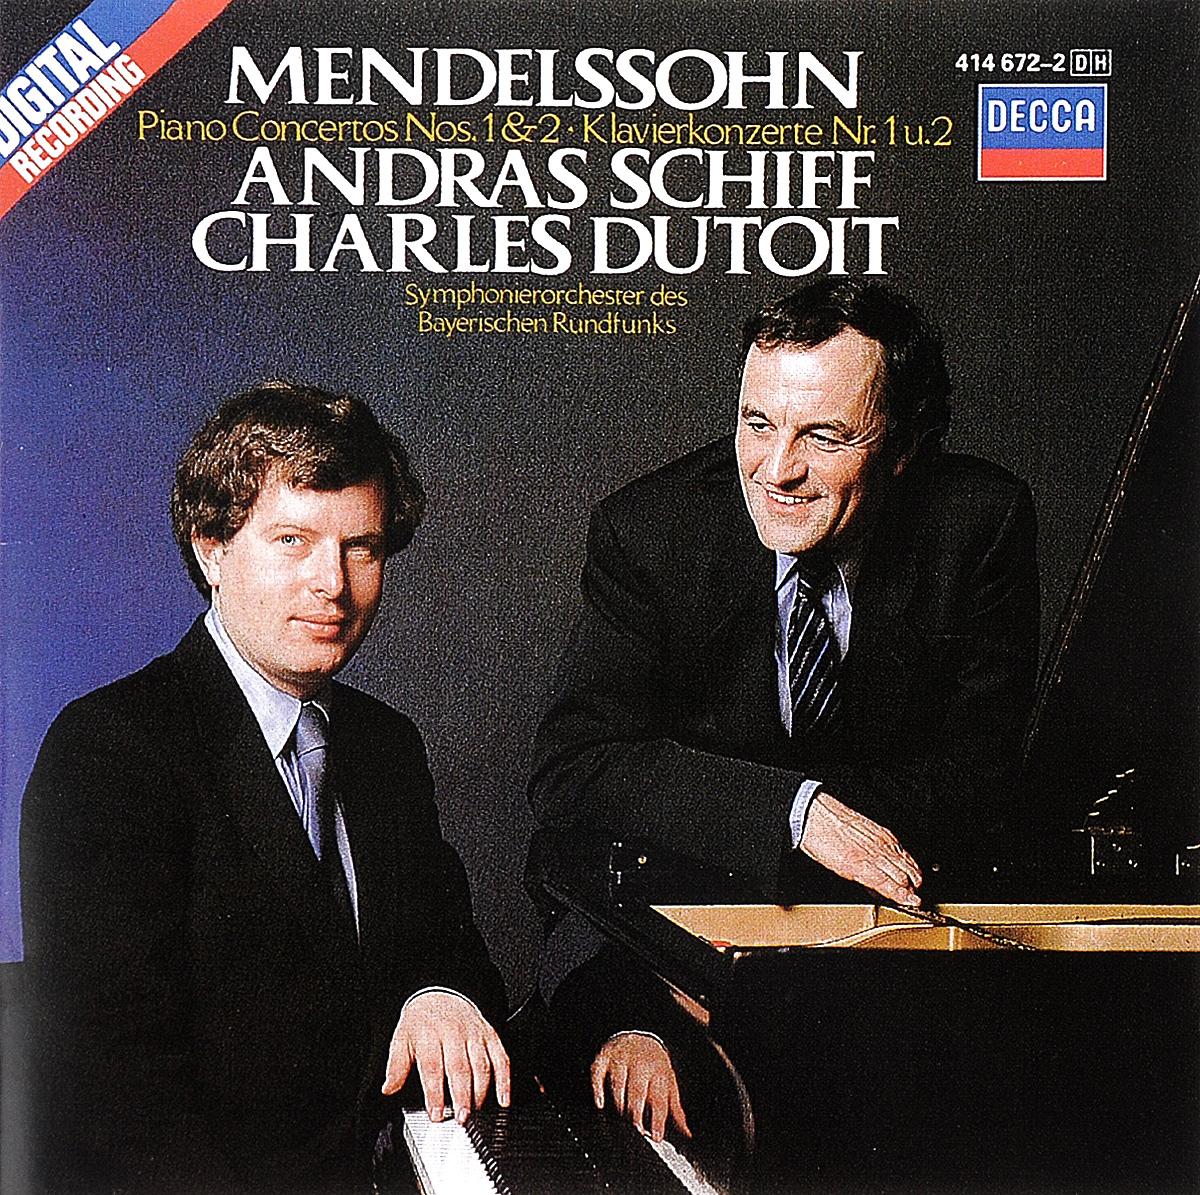 Андрас Шифф,Symphonie-Orchester Des Bayerischen Rundfunks,Шарль Дютуа Charles Dutoit. Mendelssohn. Piano Concertos Nos. 1 & 2